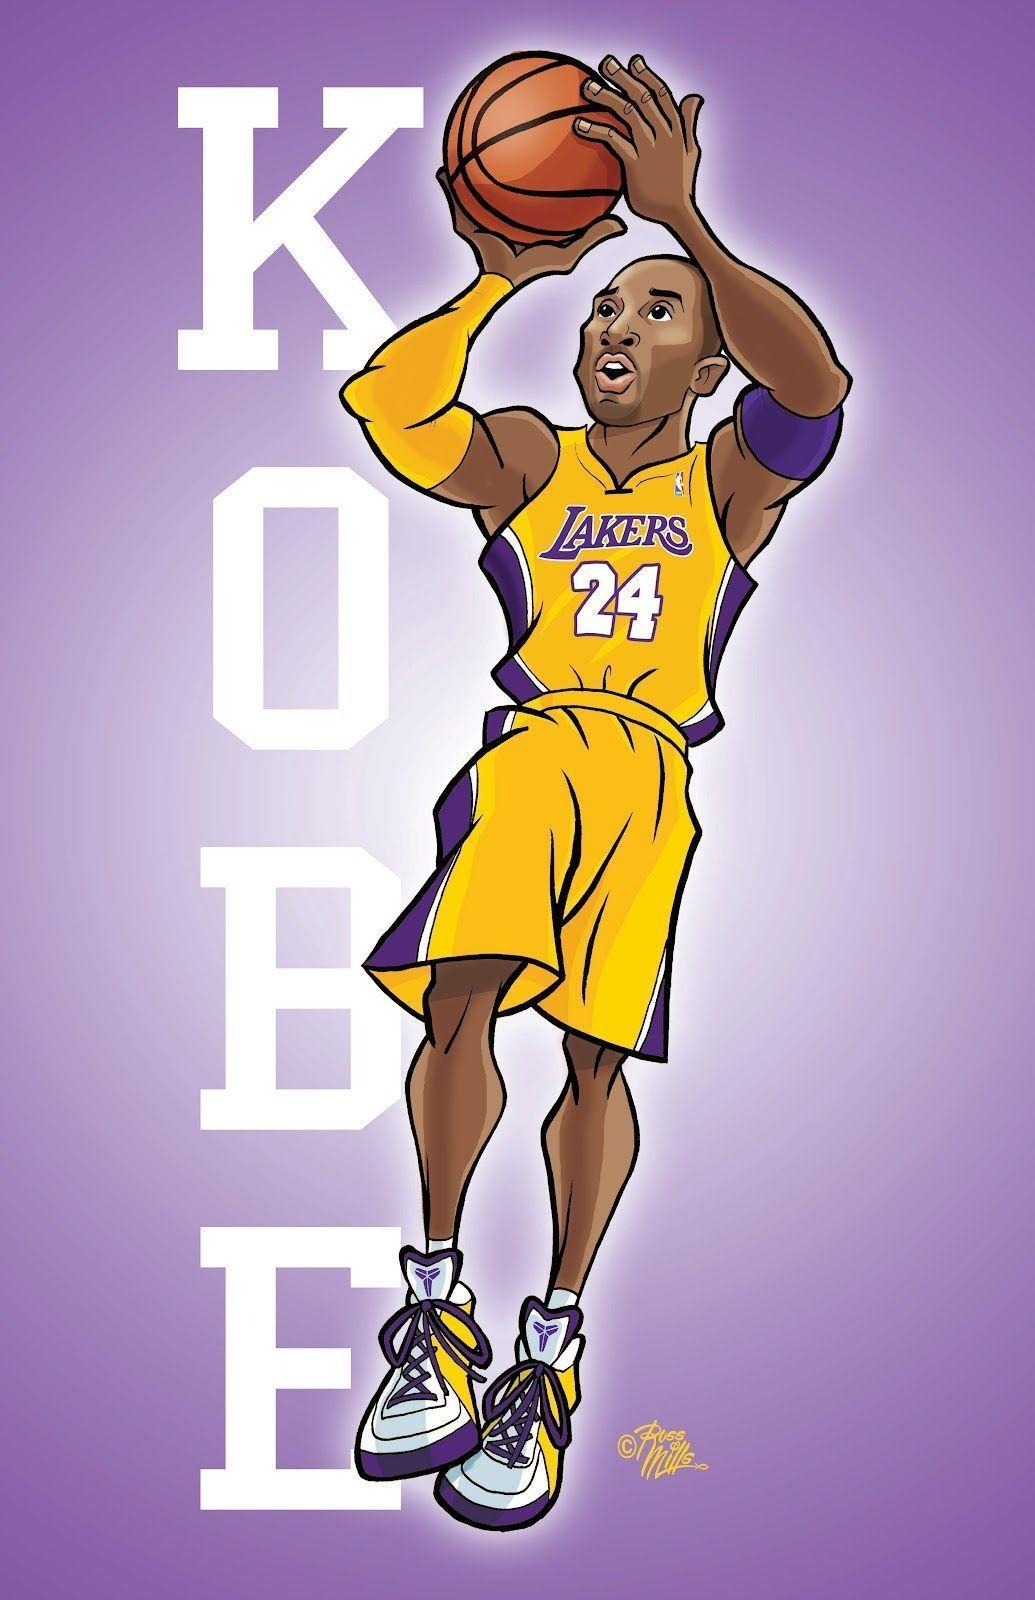 Animated Kobe Bryant Wallpaper : animated, bryant, wallpaper, Symple, Stuff, Vandusen, 29.5